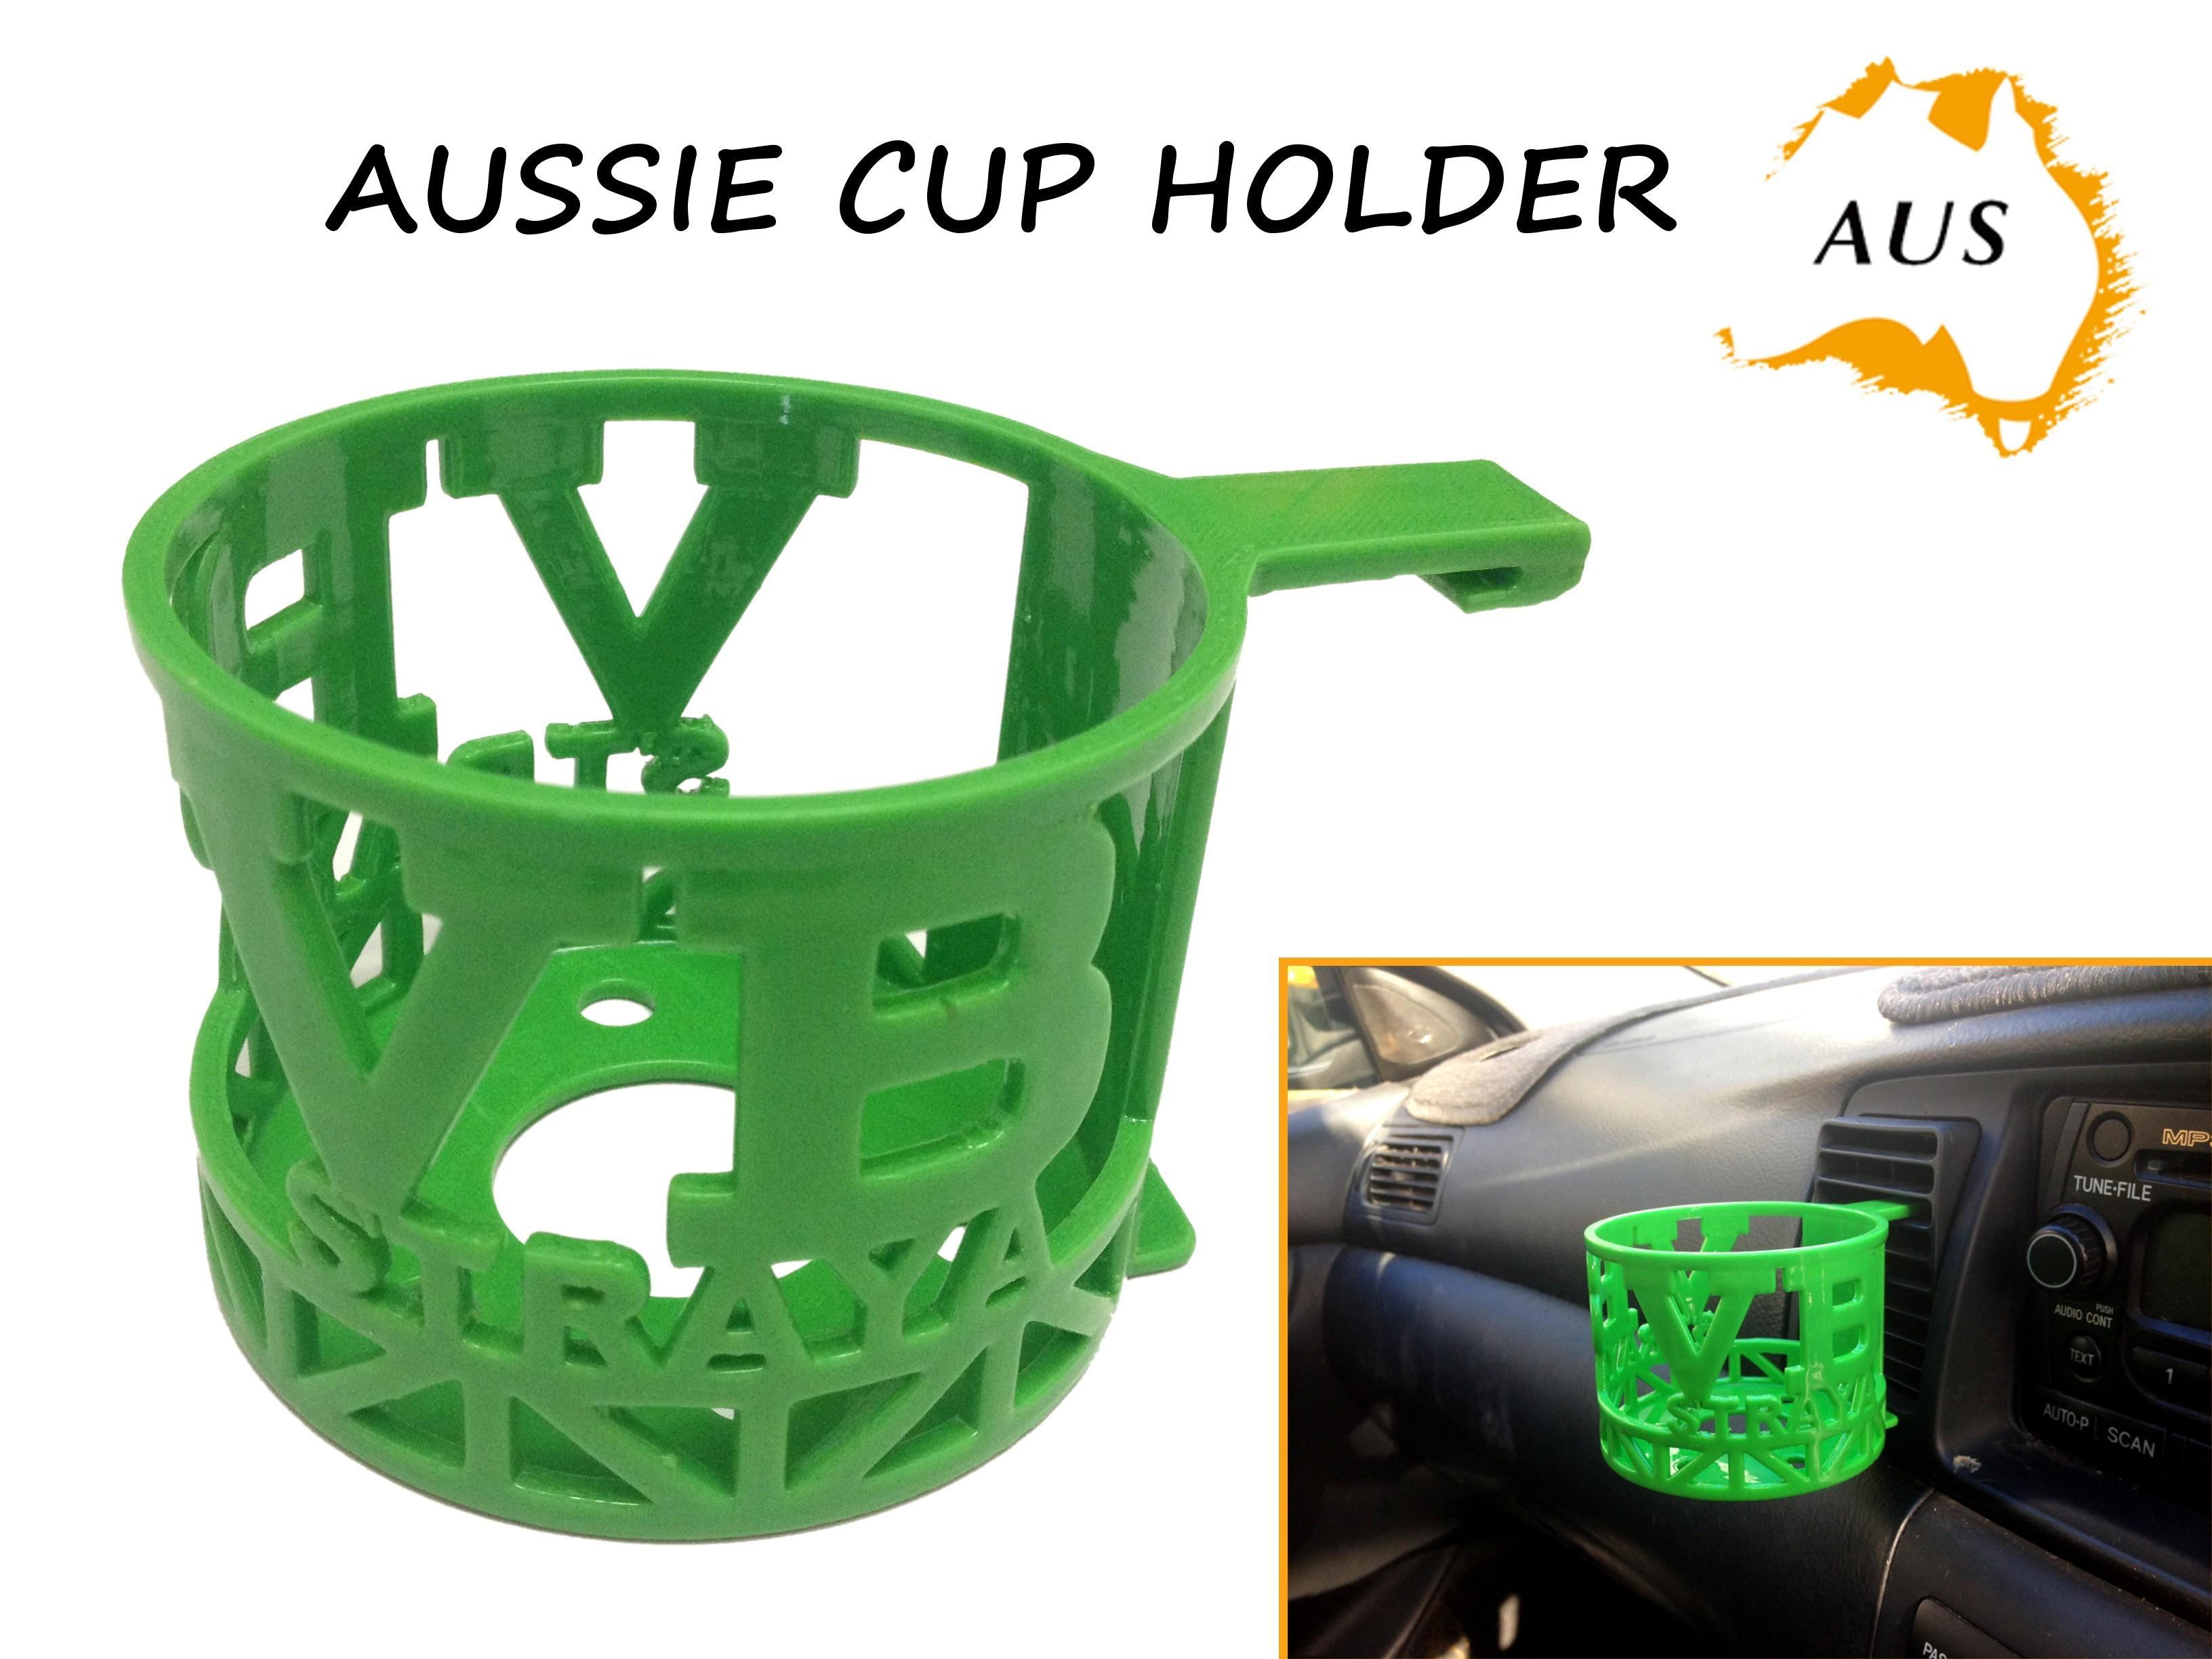 VB CAR ebay.JPG Download STL file Aussie Car Cup Holder • Template to 3D print, Custom3DPrinting